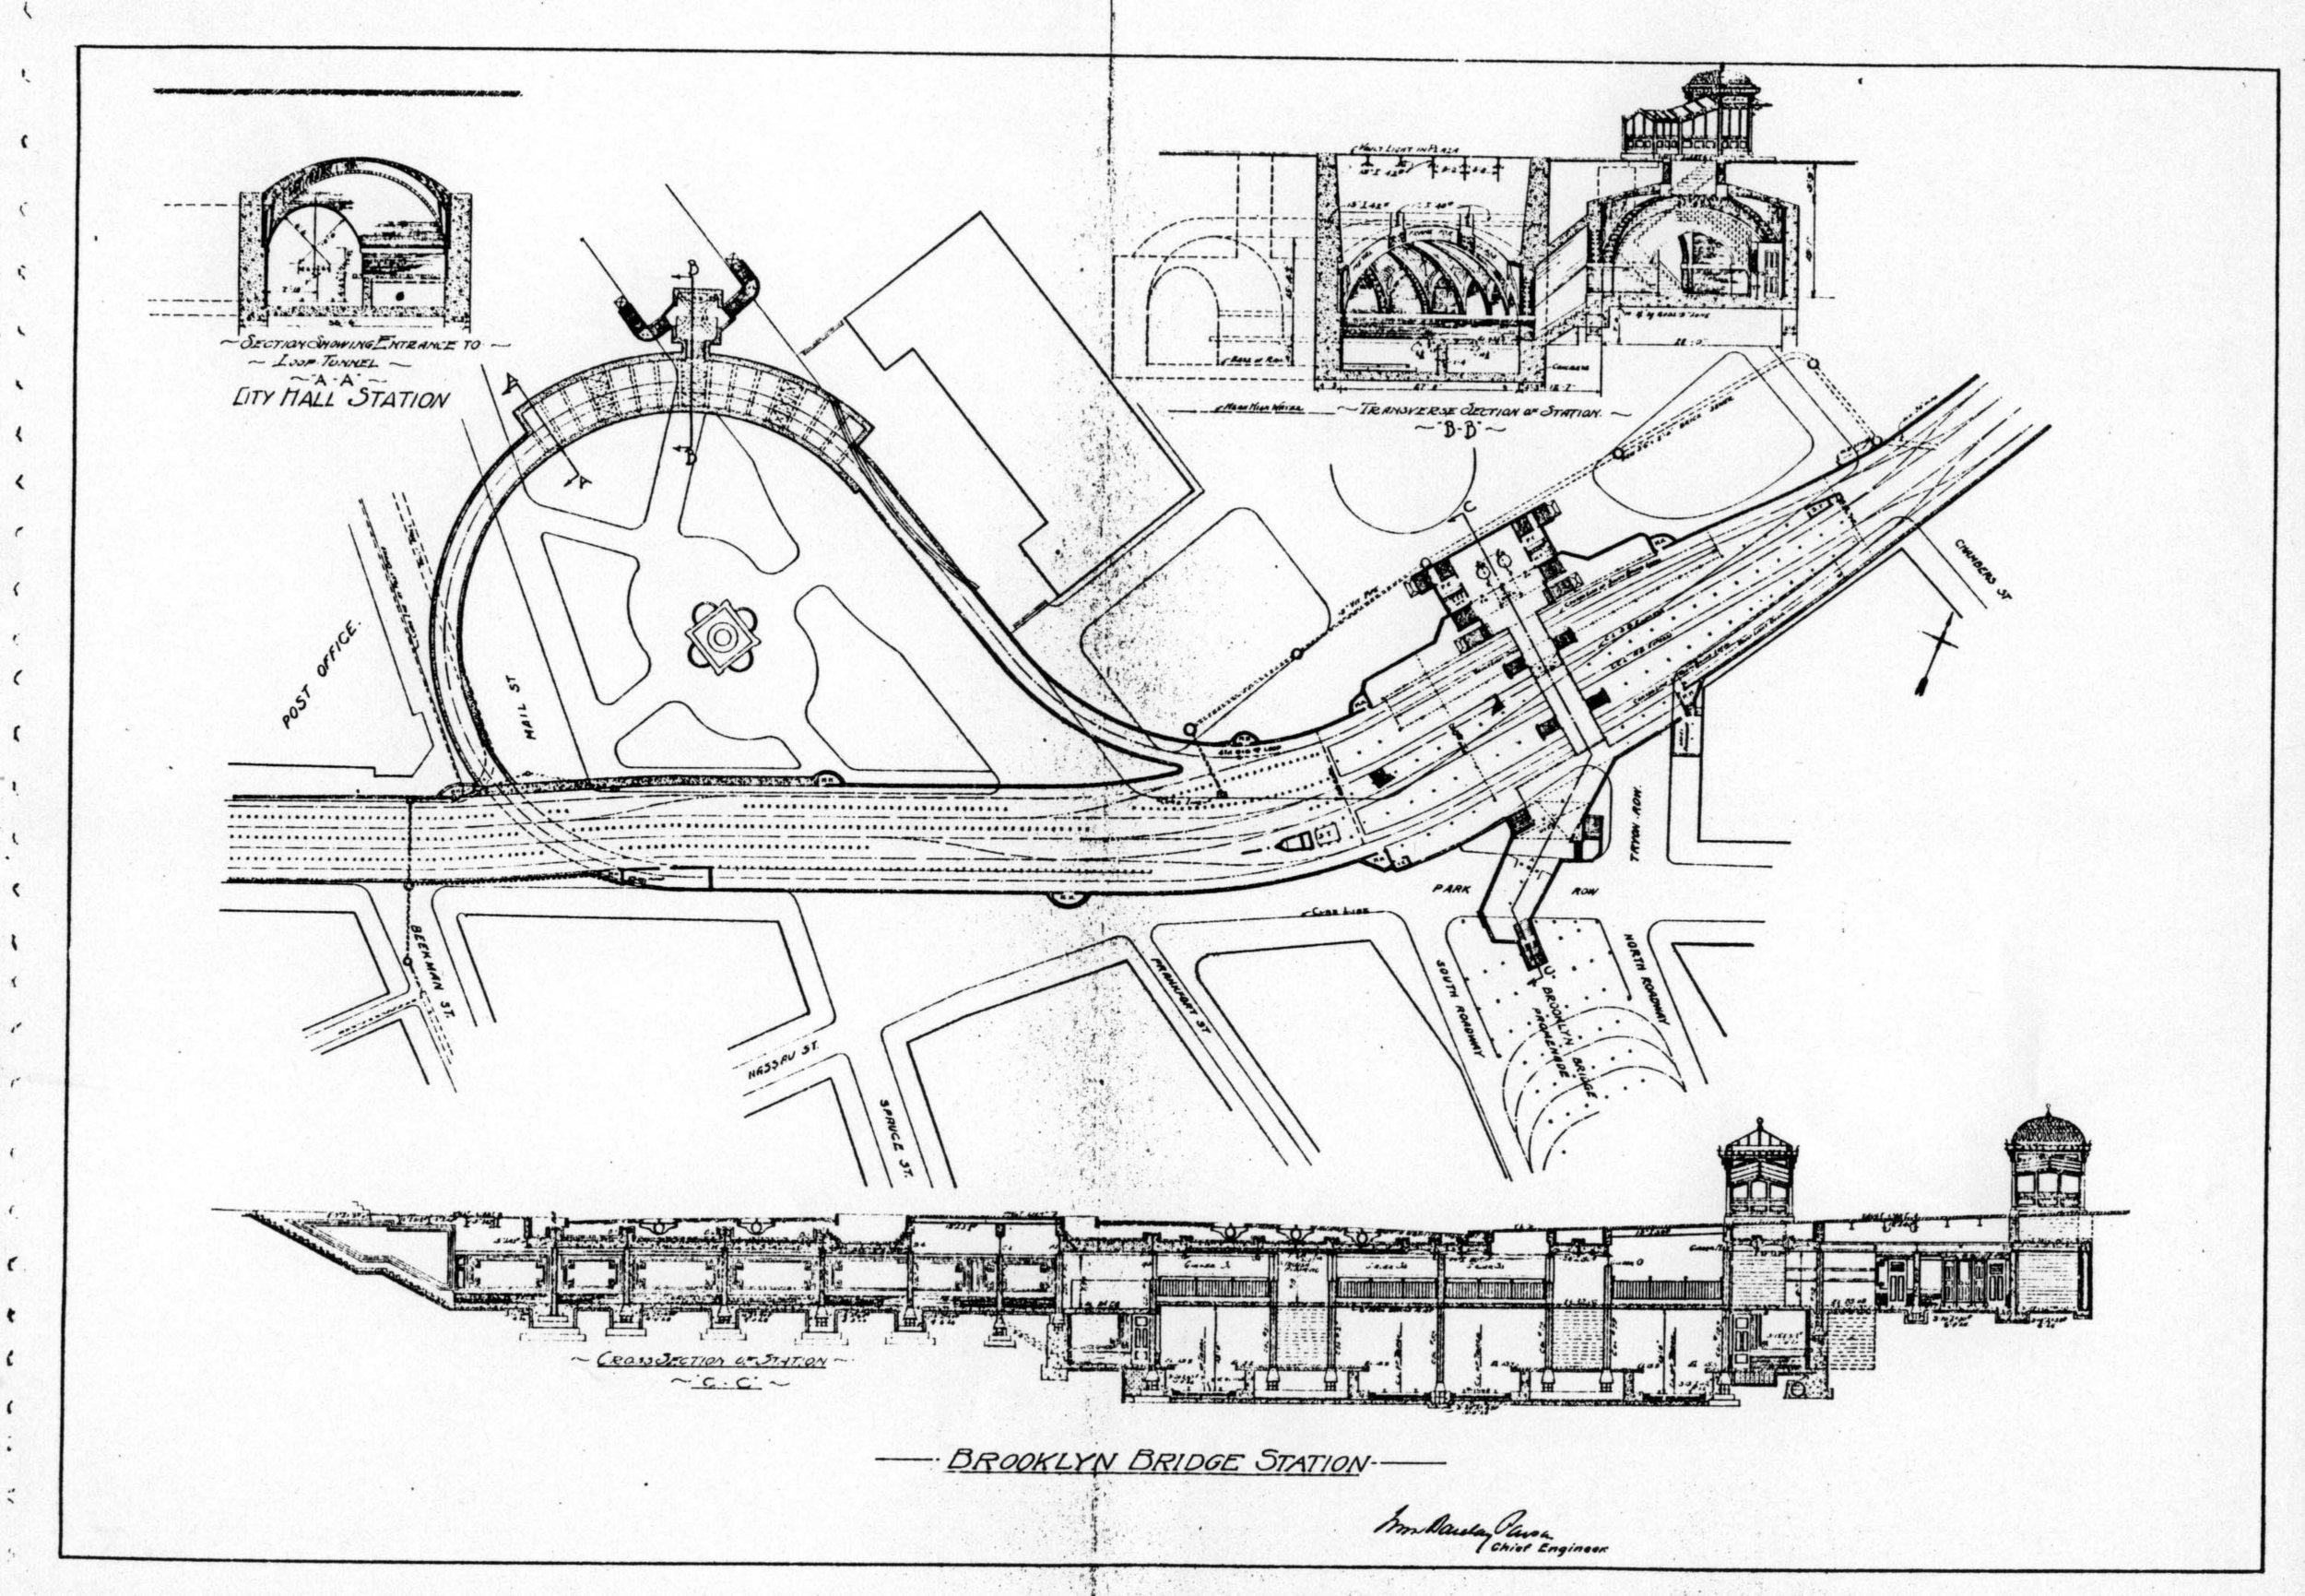 diagram_city_hall_bkbr_station.jpg